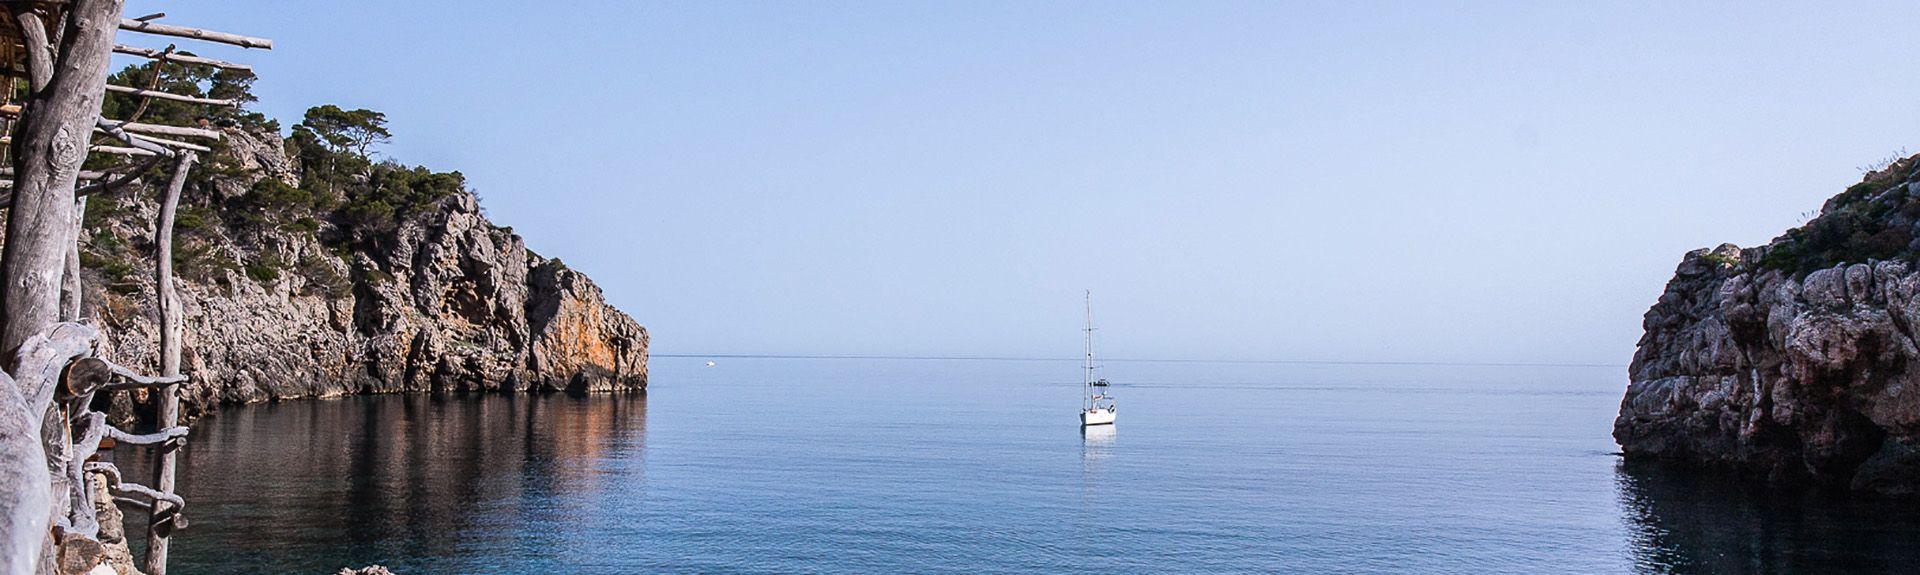 Cala Banyalbufar, Banyalbufar, Balearic Islands, Spain